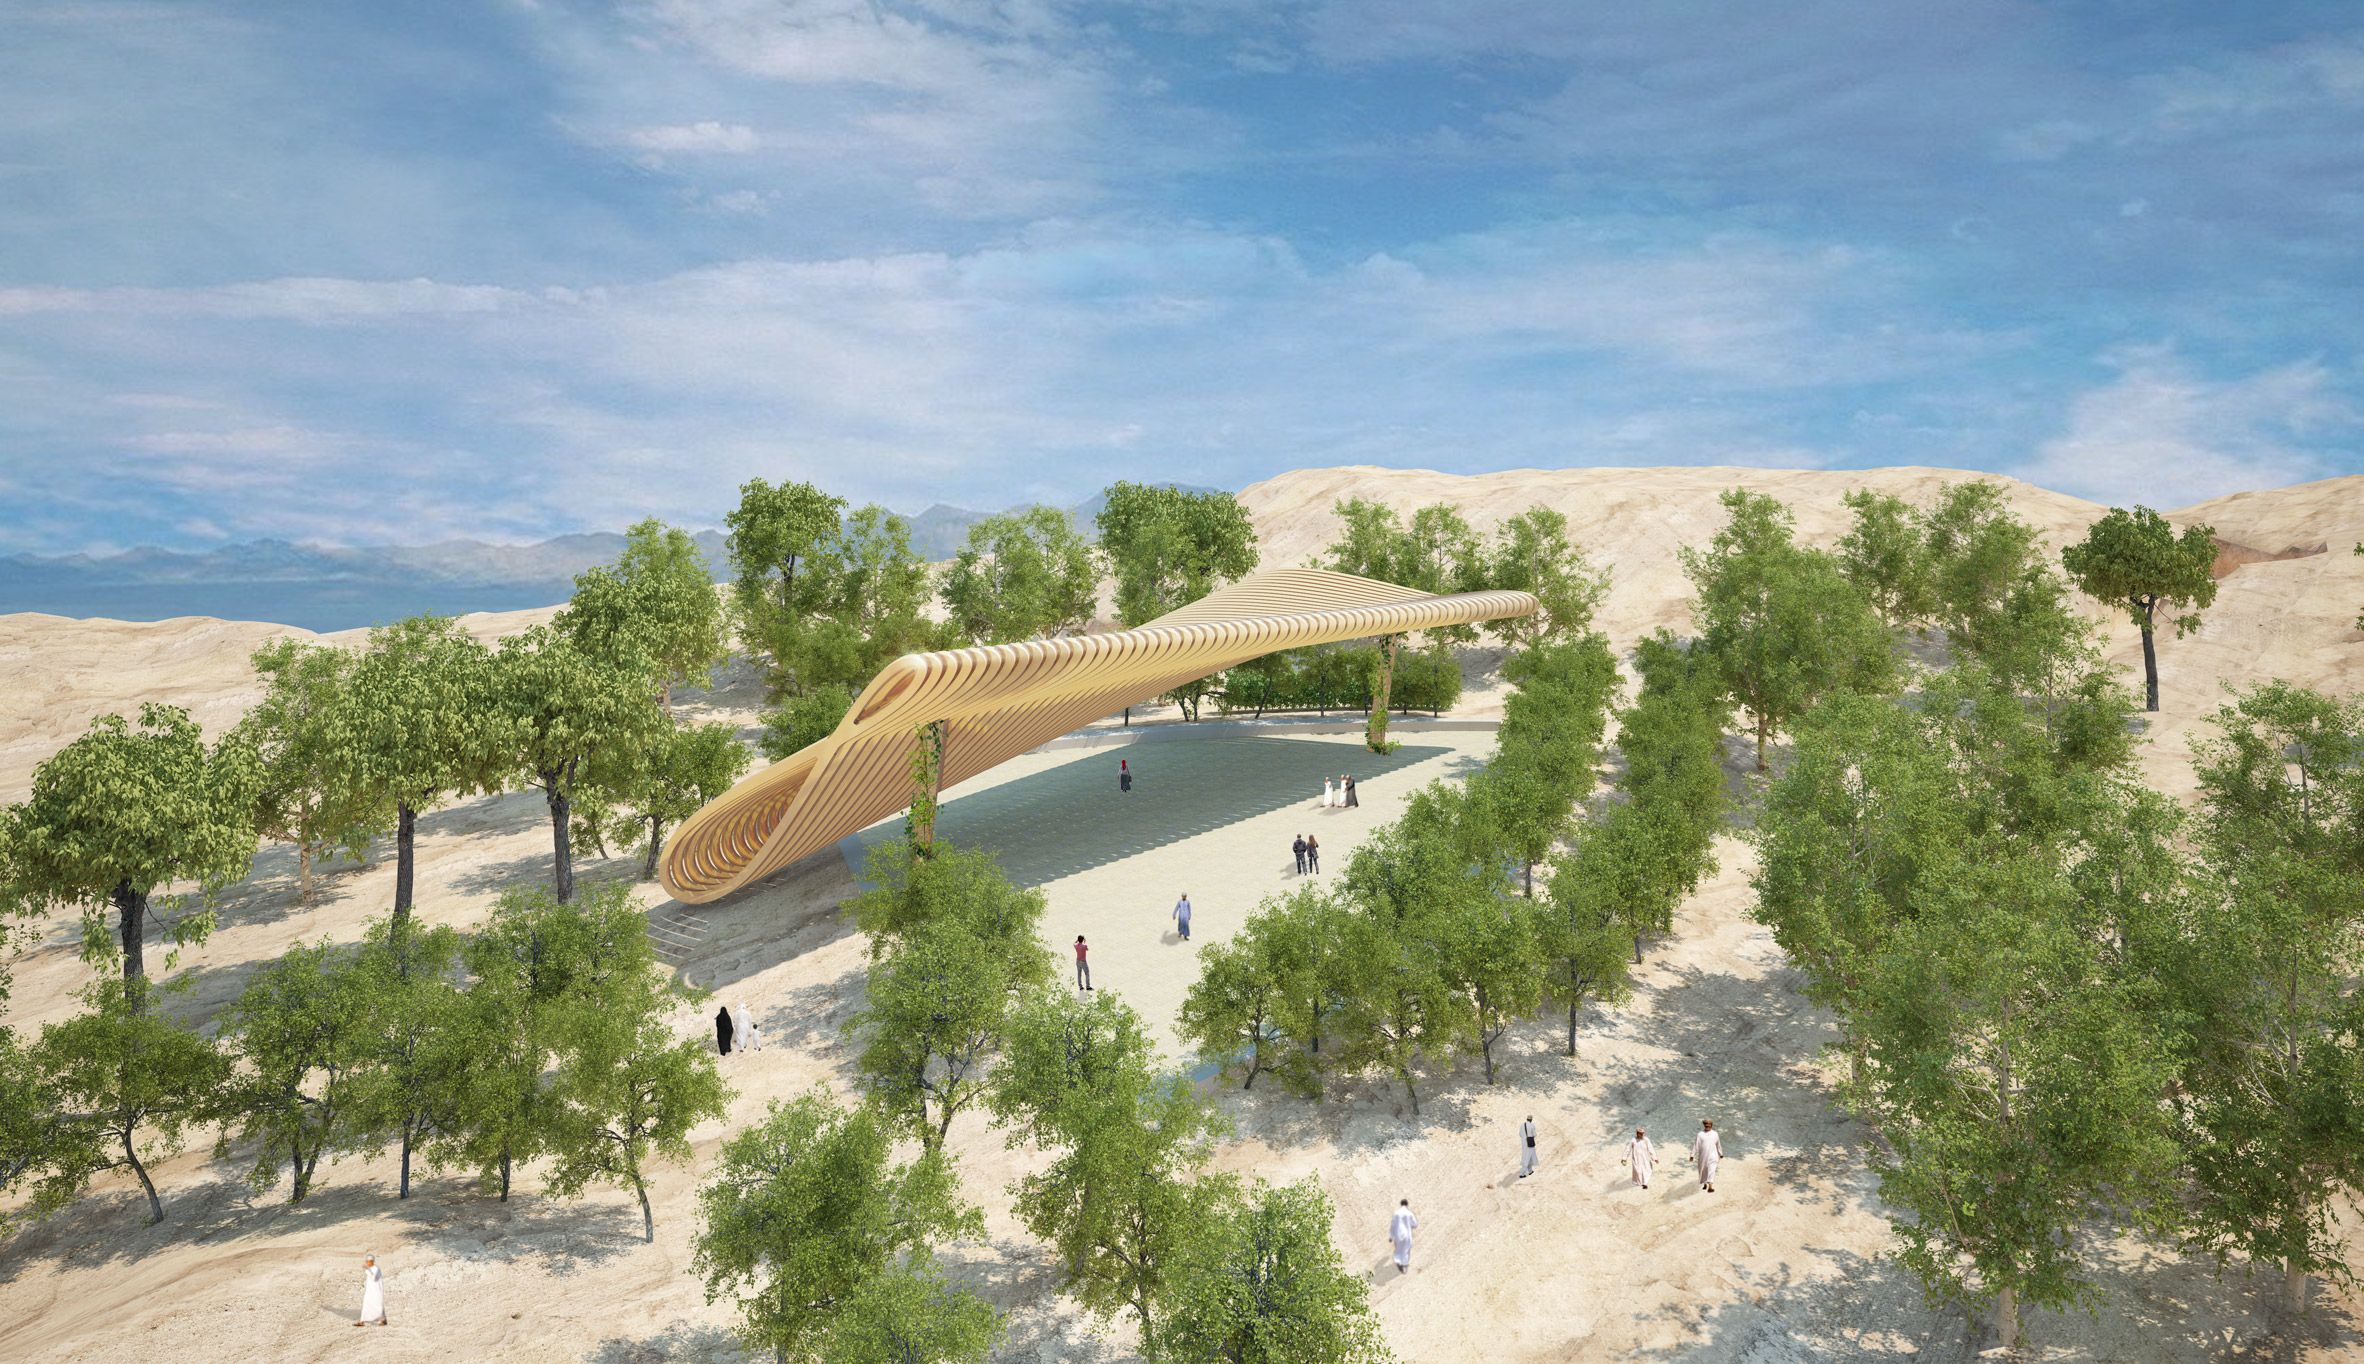 Paul Cocksedge designs 33-metre-long garden canopy that mimics the path of the sun